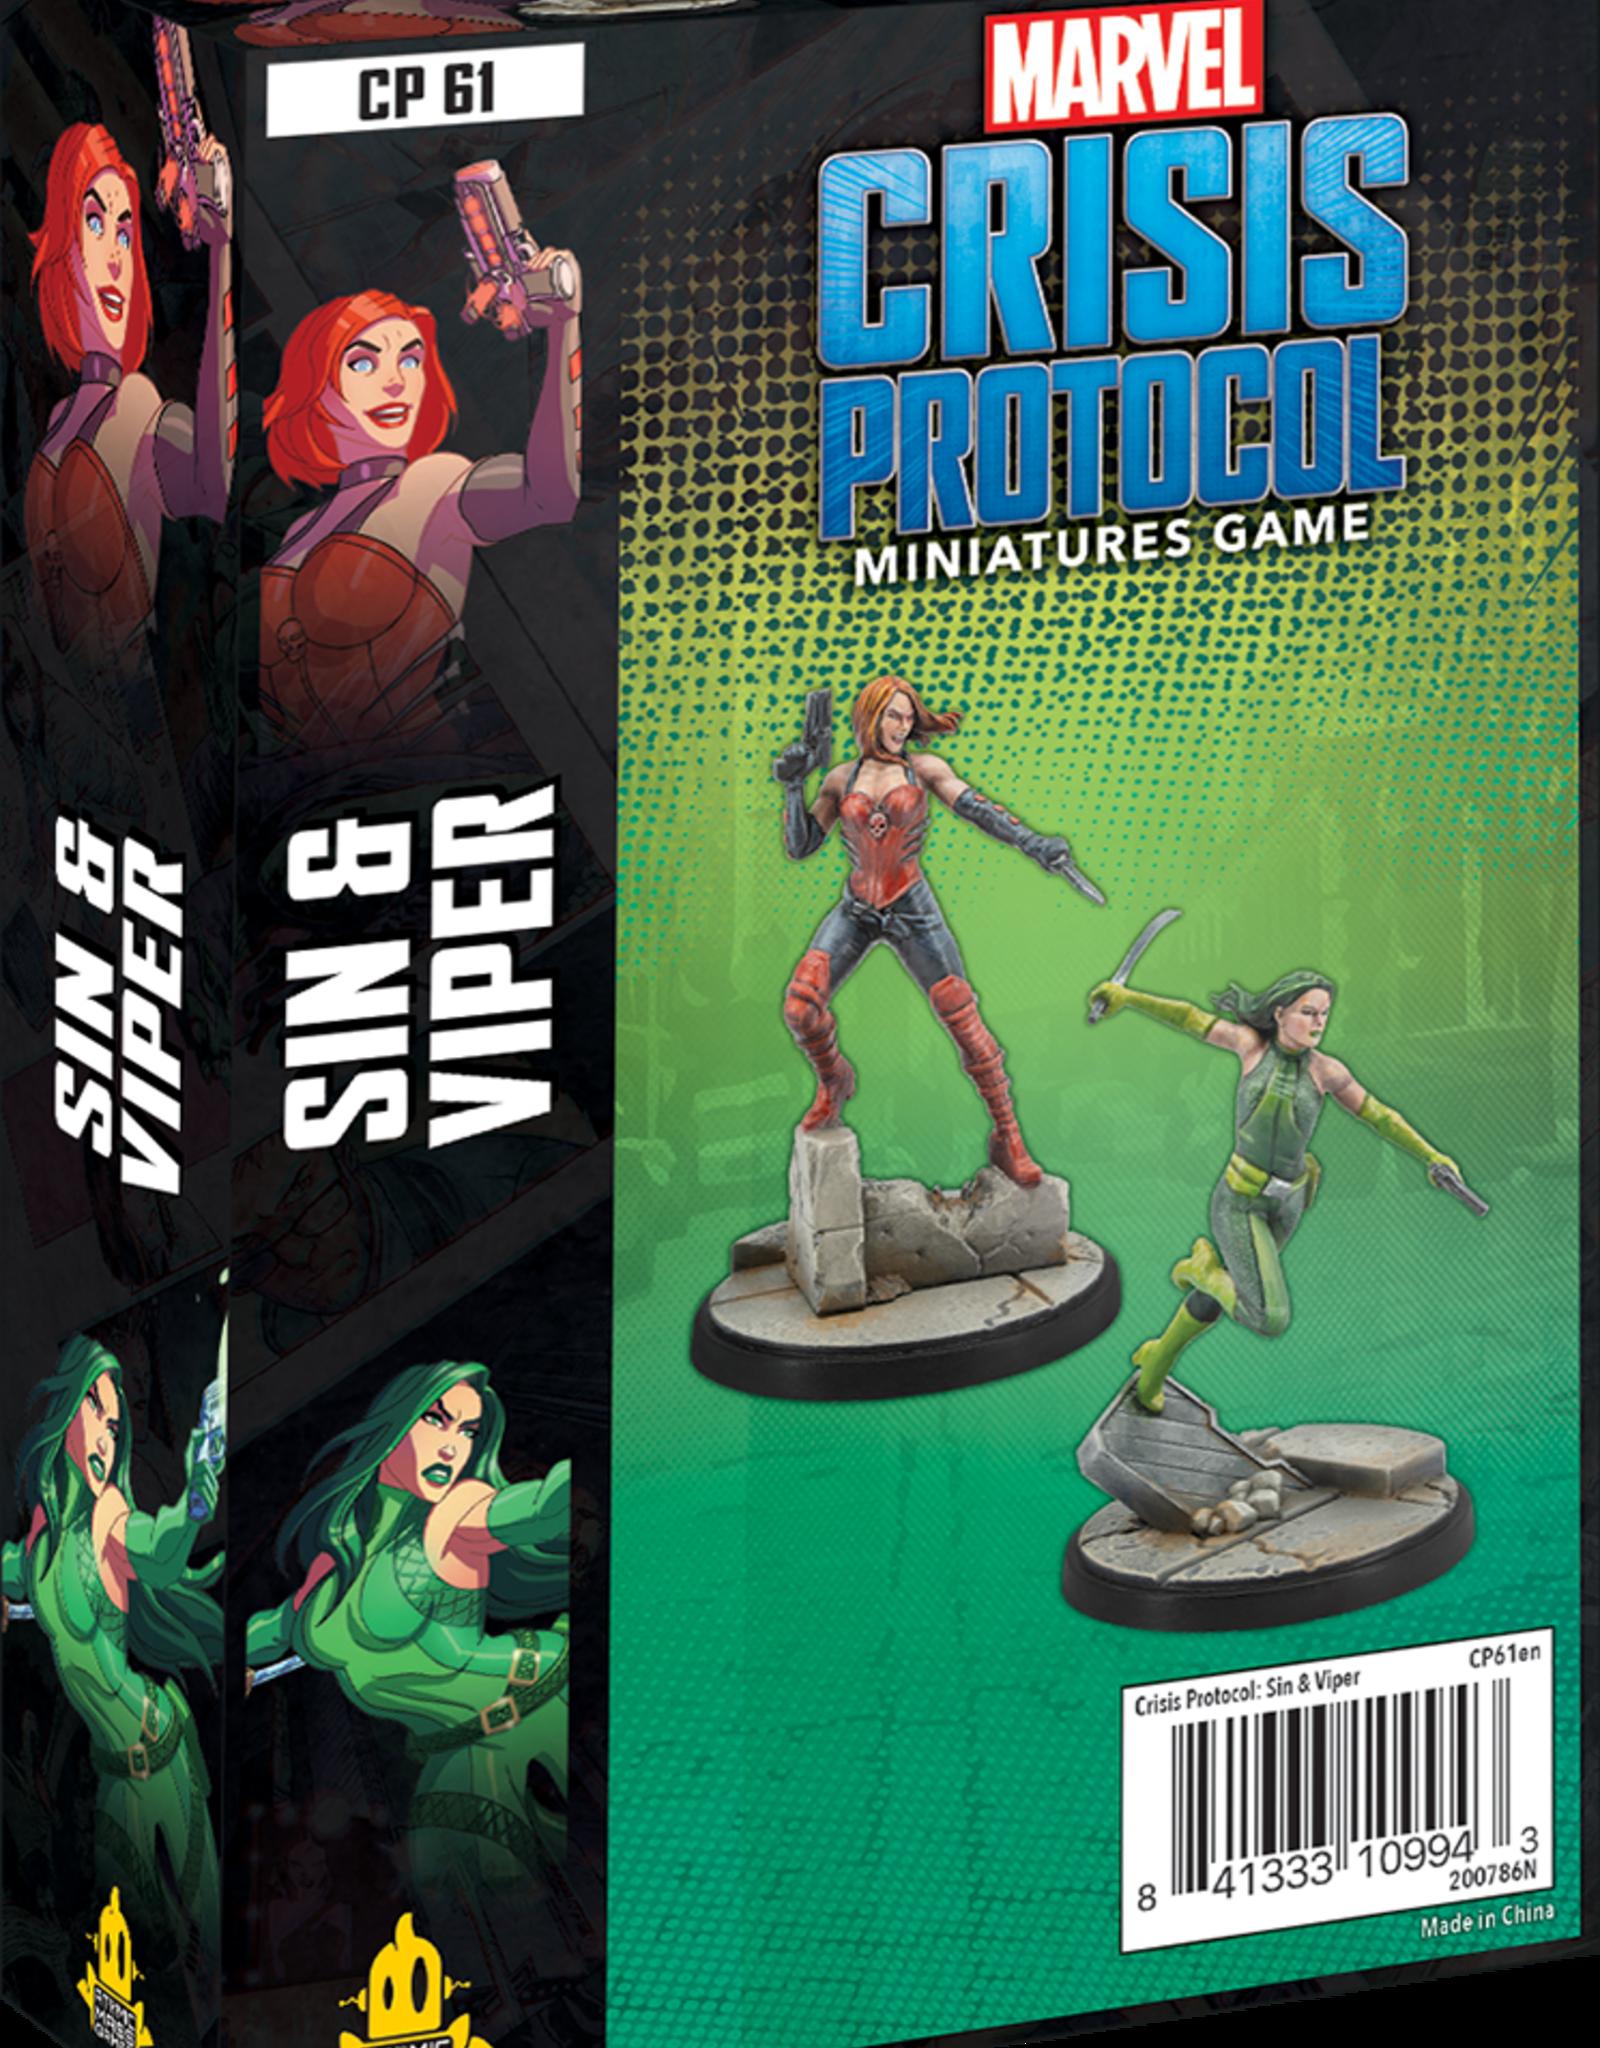 Atomic Mass Marvel Crisis Protocol: Sin and Viper